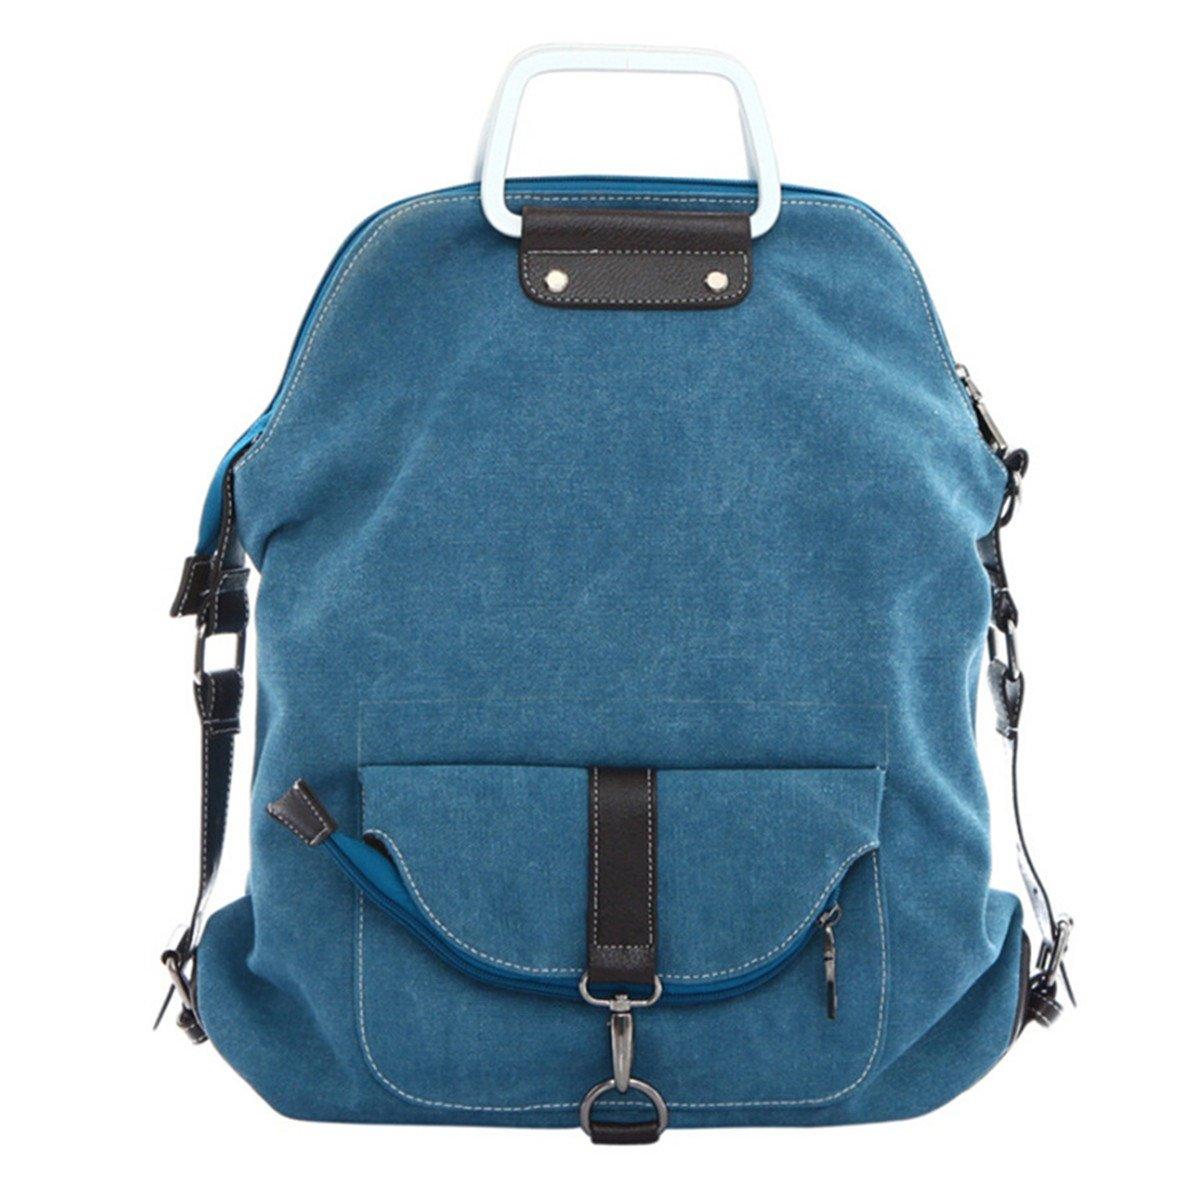 Tiny Chou Multi-functional Women's Top Handble Canvas Handbag Vintage Crossbody Bag Cute Backpack